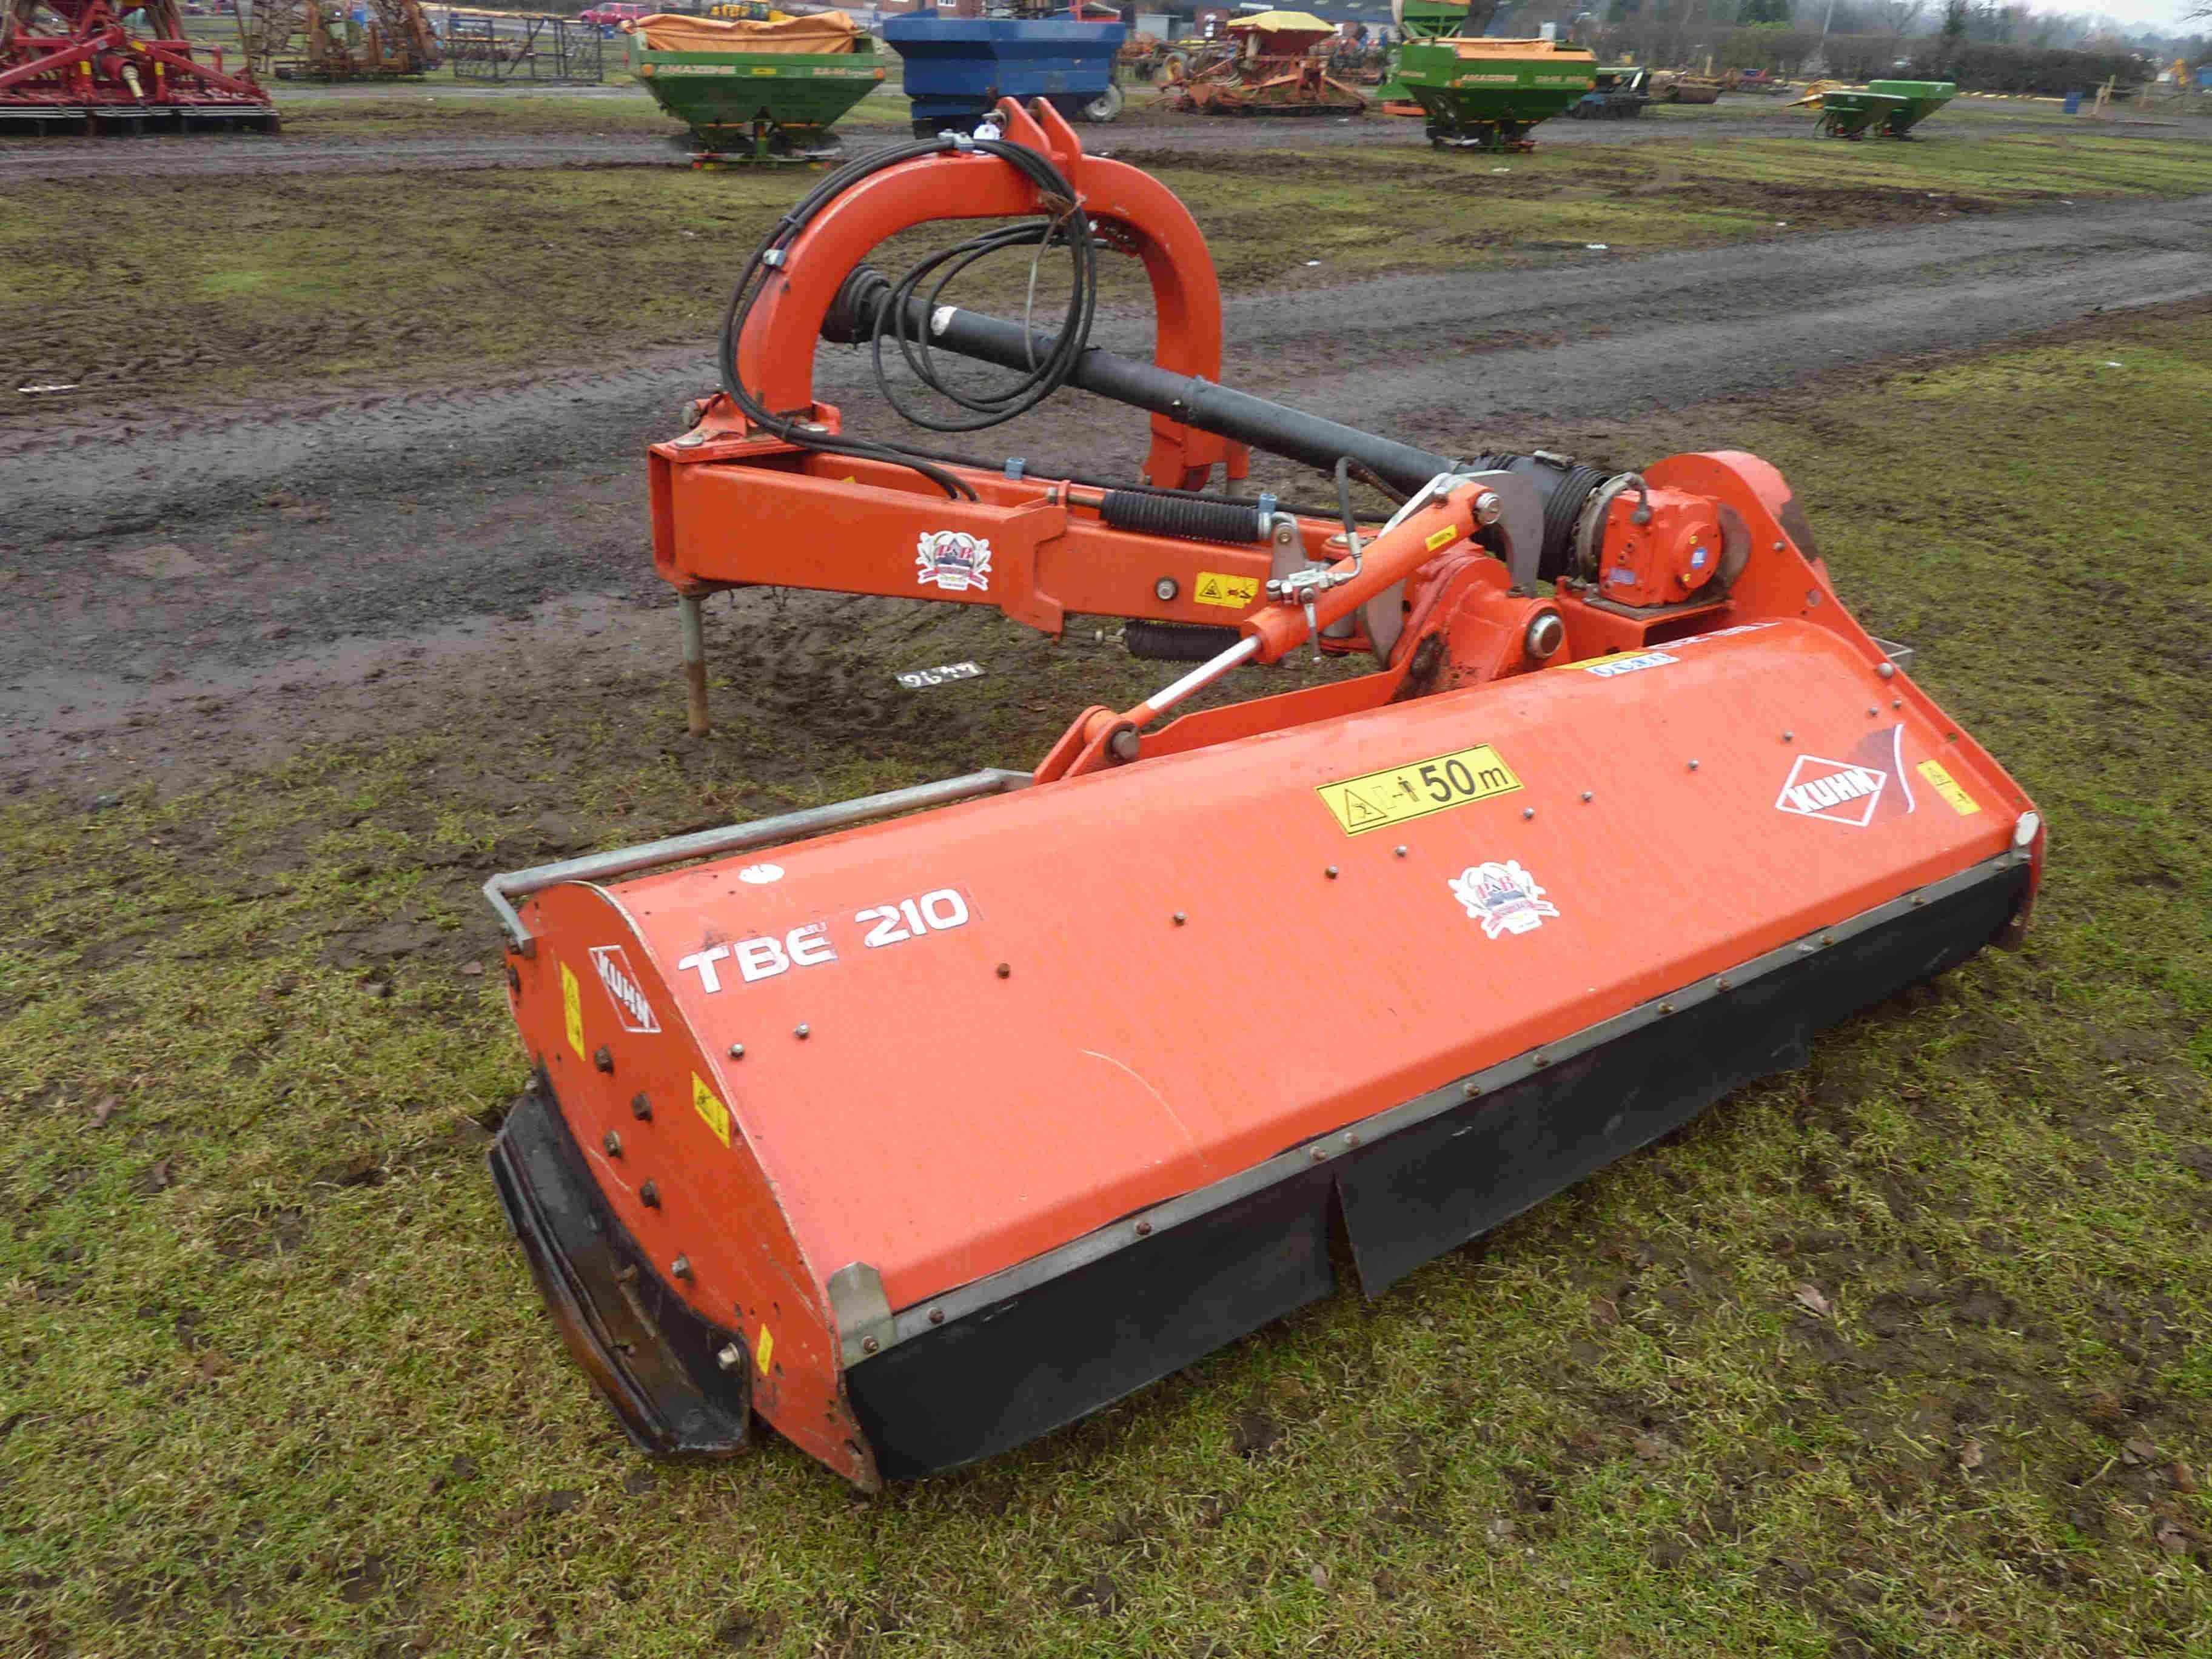 4496 Kuhn TBE 210 offset flail mower